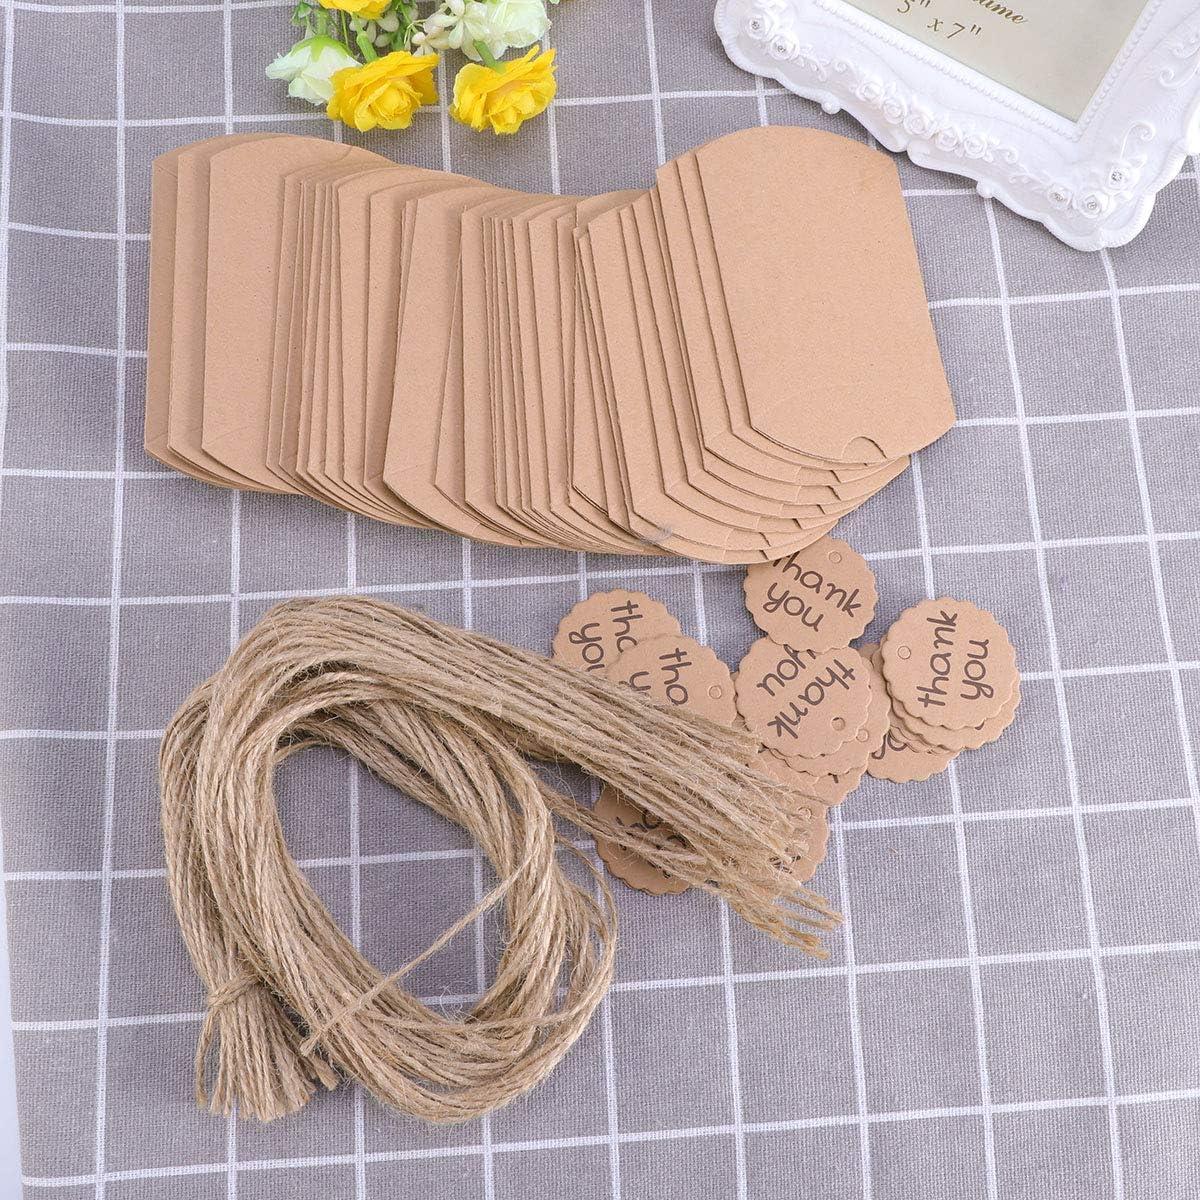 YeahiBaby Kraft Paper Pillow Box Thank You Card Retro Gift Box DIY Wedding Birthday Party Favors 20pcs